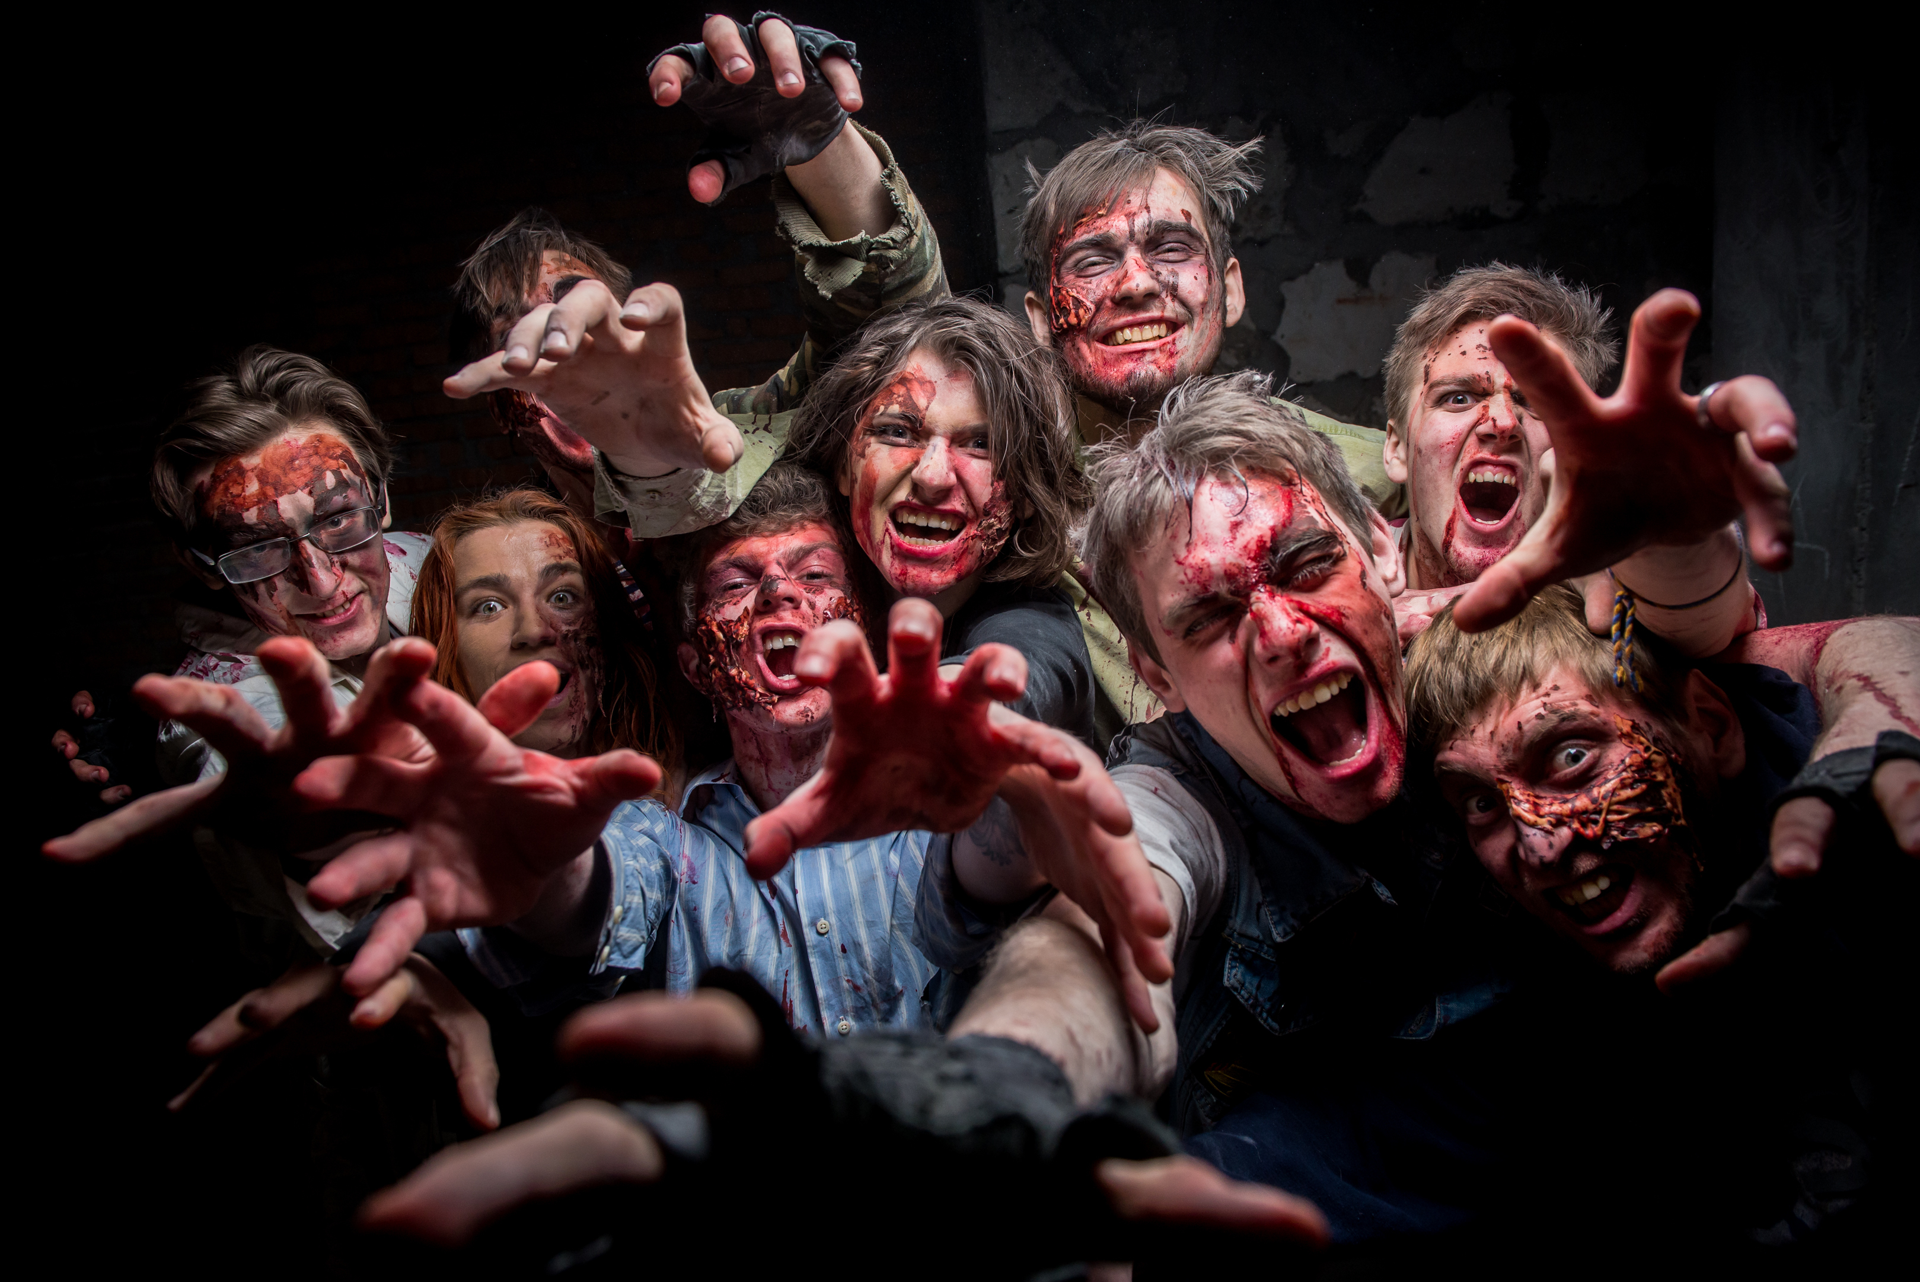 Zombie Costume How-To